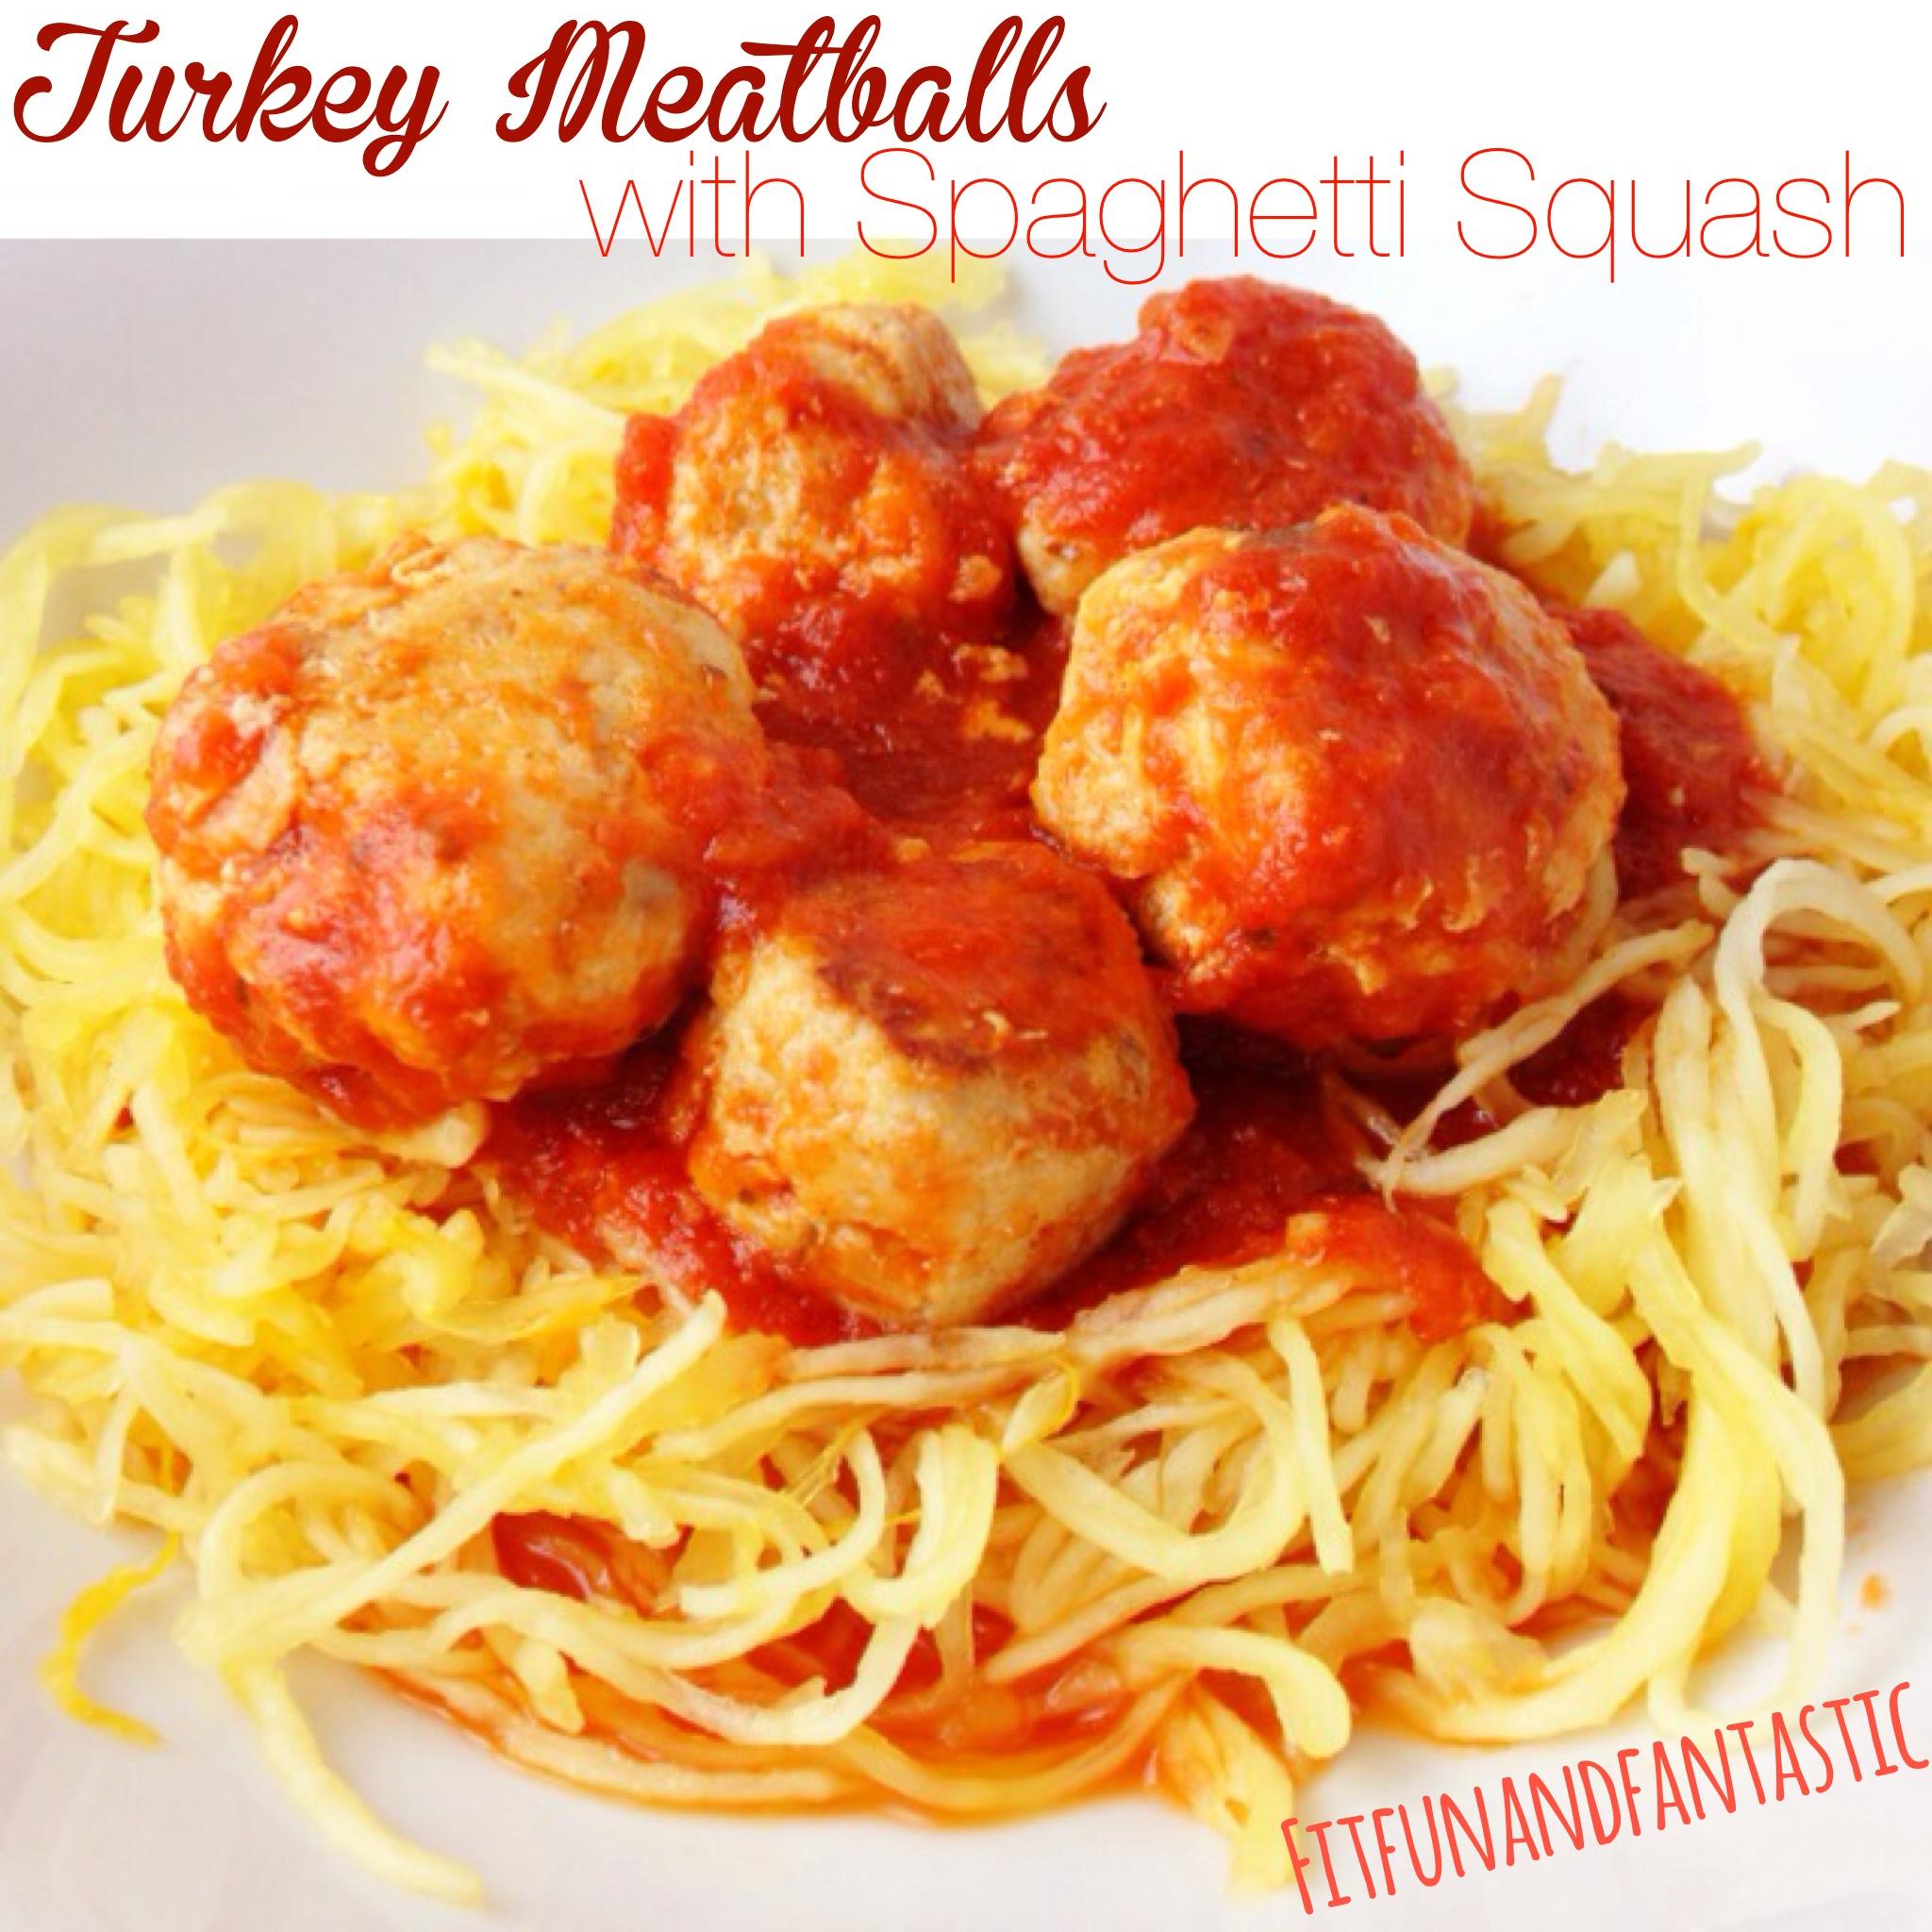 Fantastically Fit | Turkey Meatballs with Spaghetti Squash